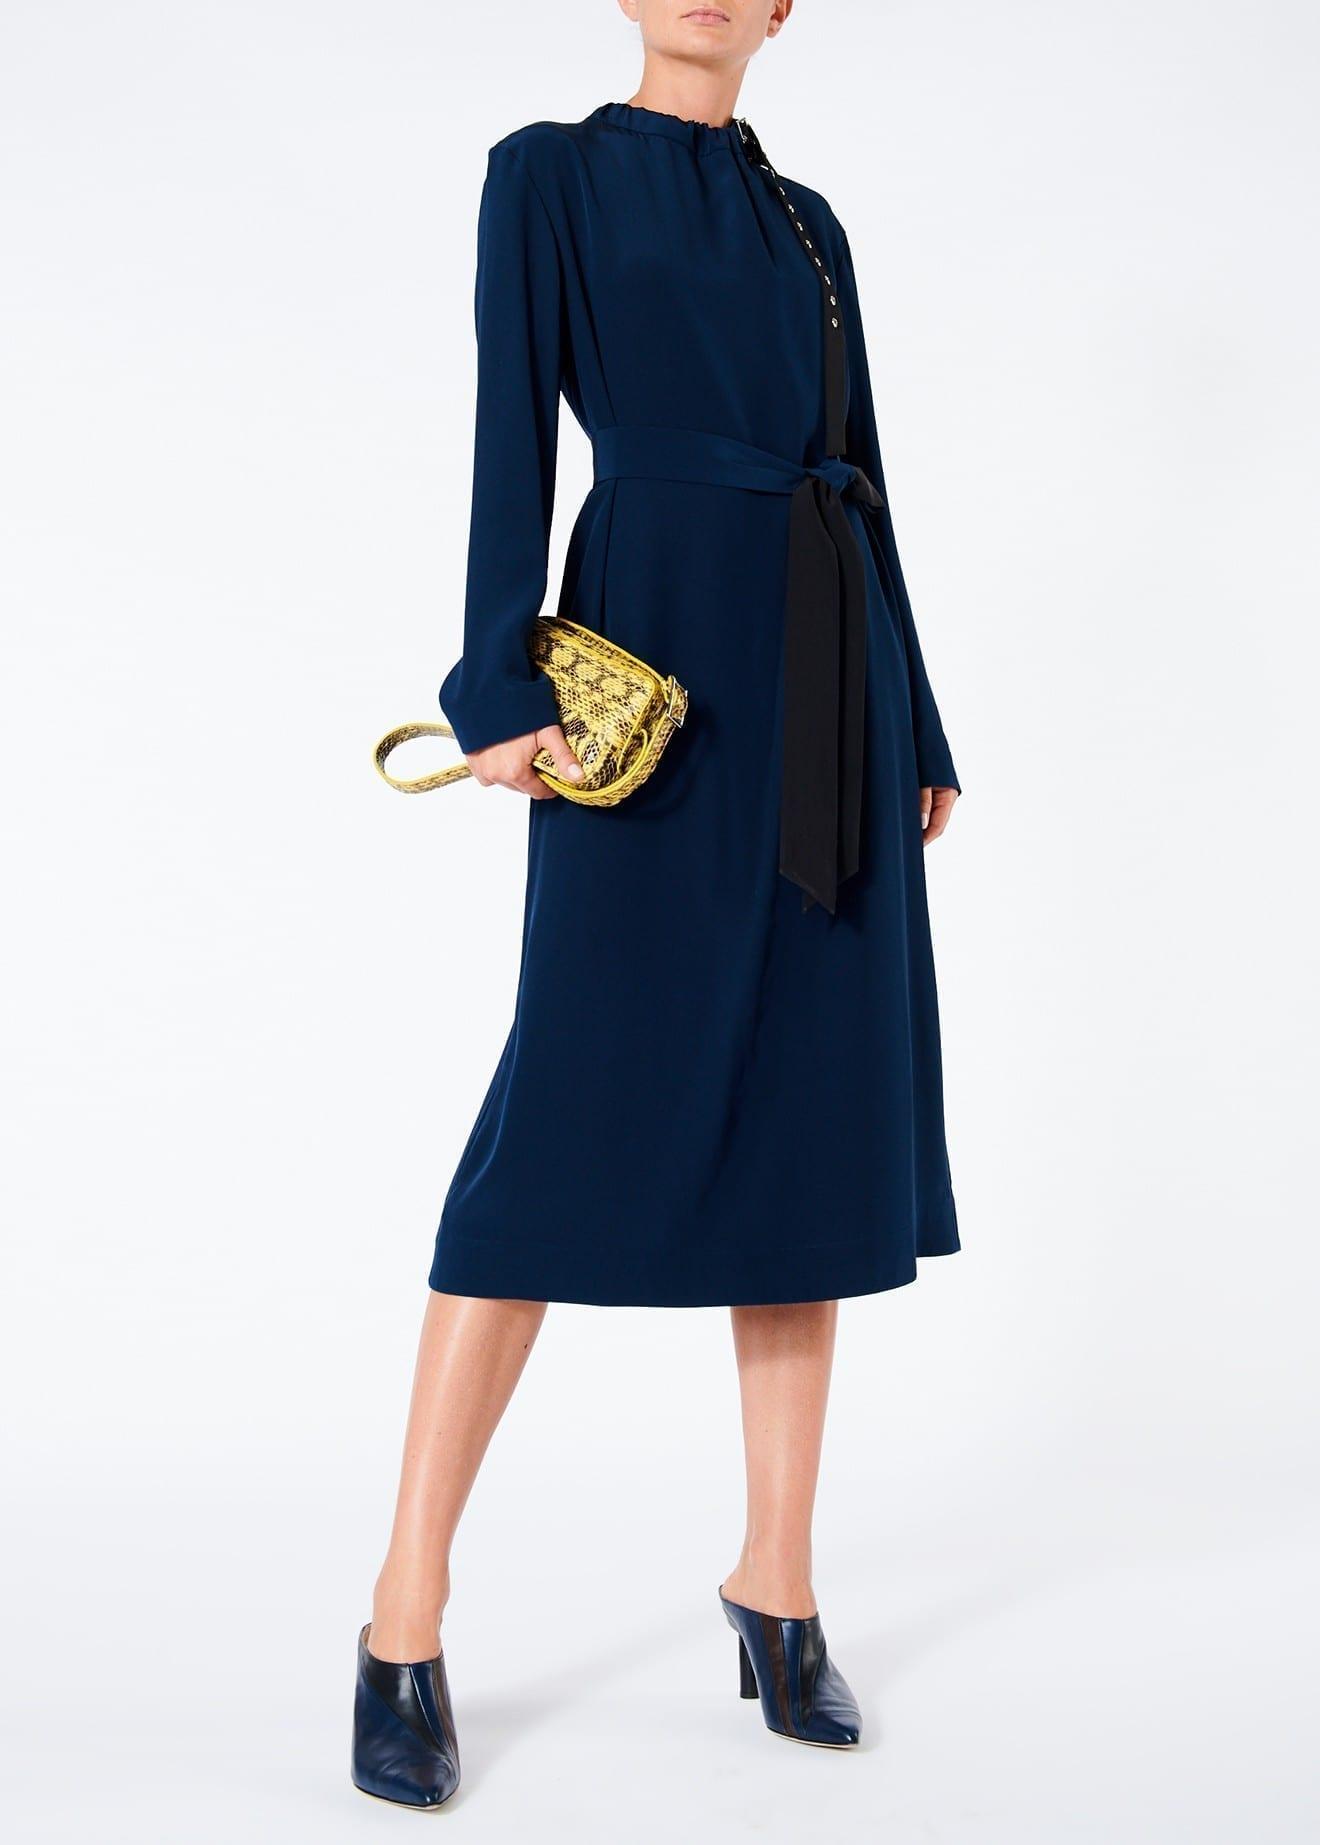 TIBI Silk Color Block Midi Navy Dress